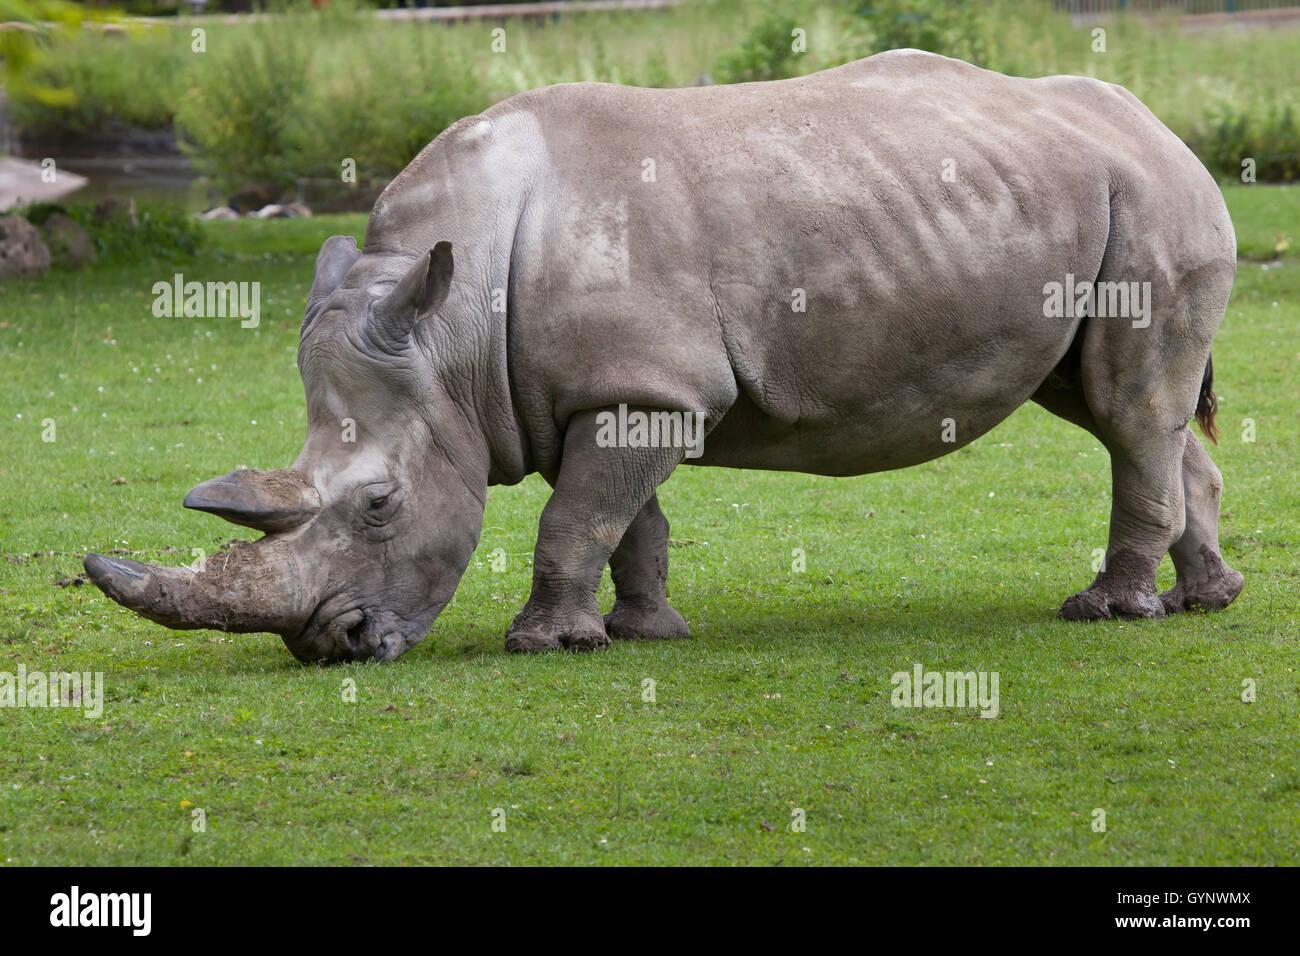 Southern white rhinoceros (Ceratotherium simum simum) at Augsburg Zoo in Bavaria, Germany. - Stock Image